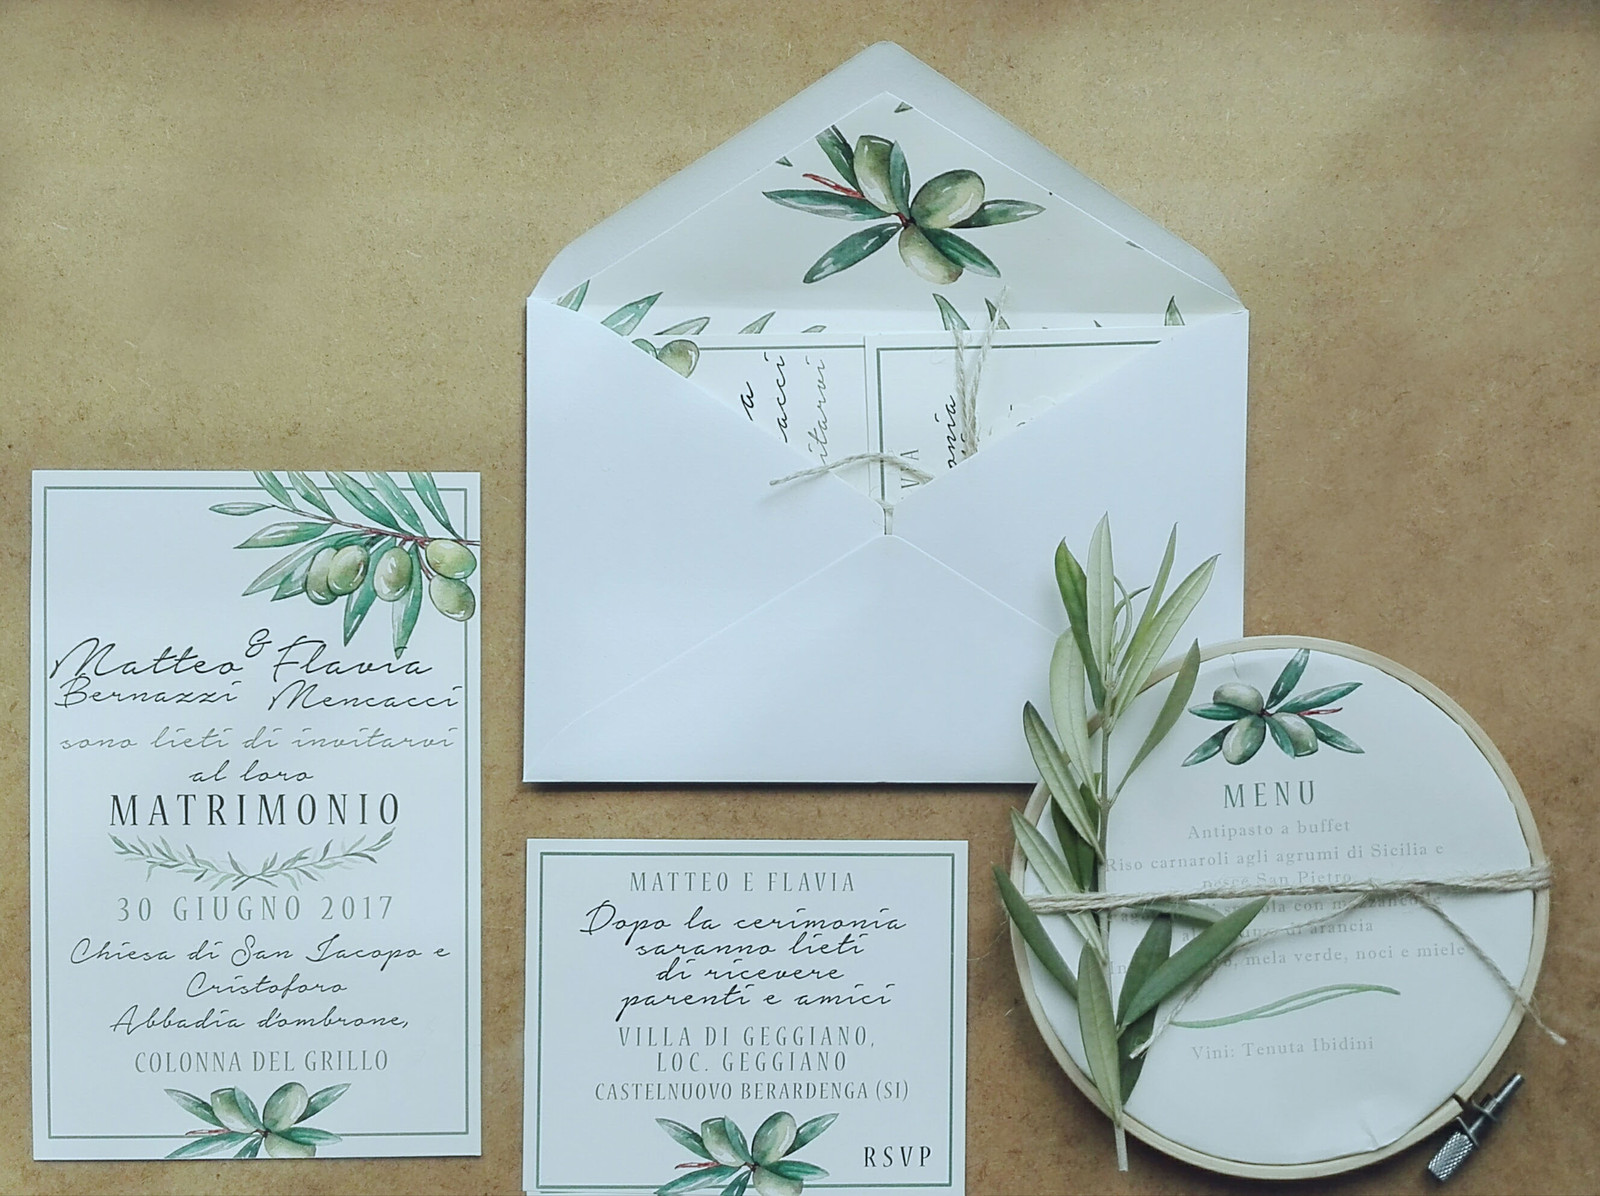 Busta Matrimonio Toscana : Partecipazioni toscana italia pratesi designer